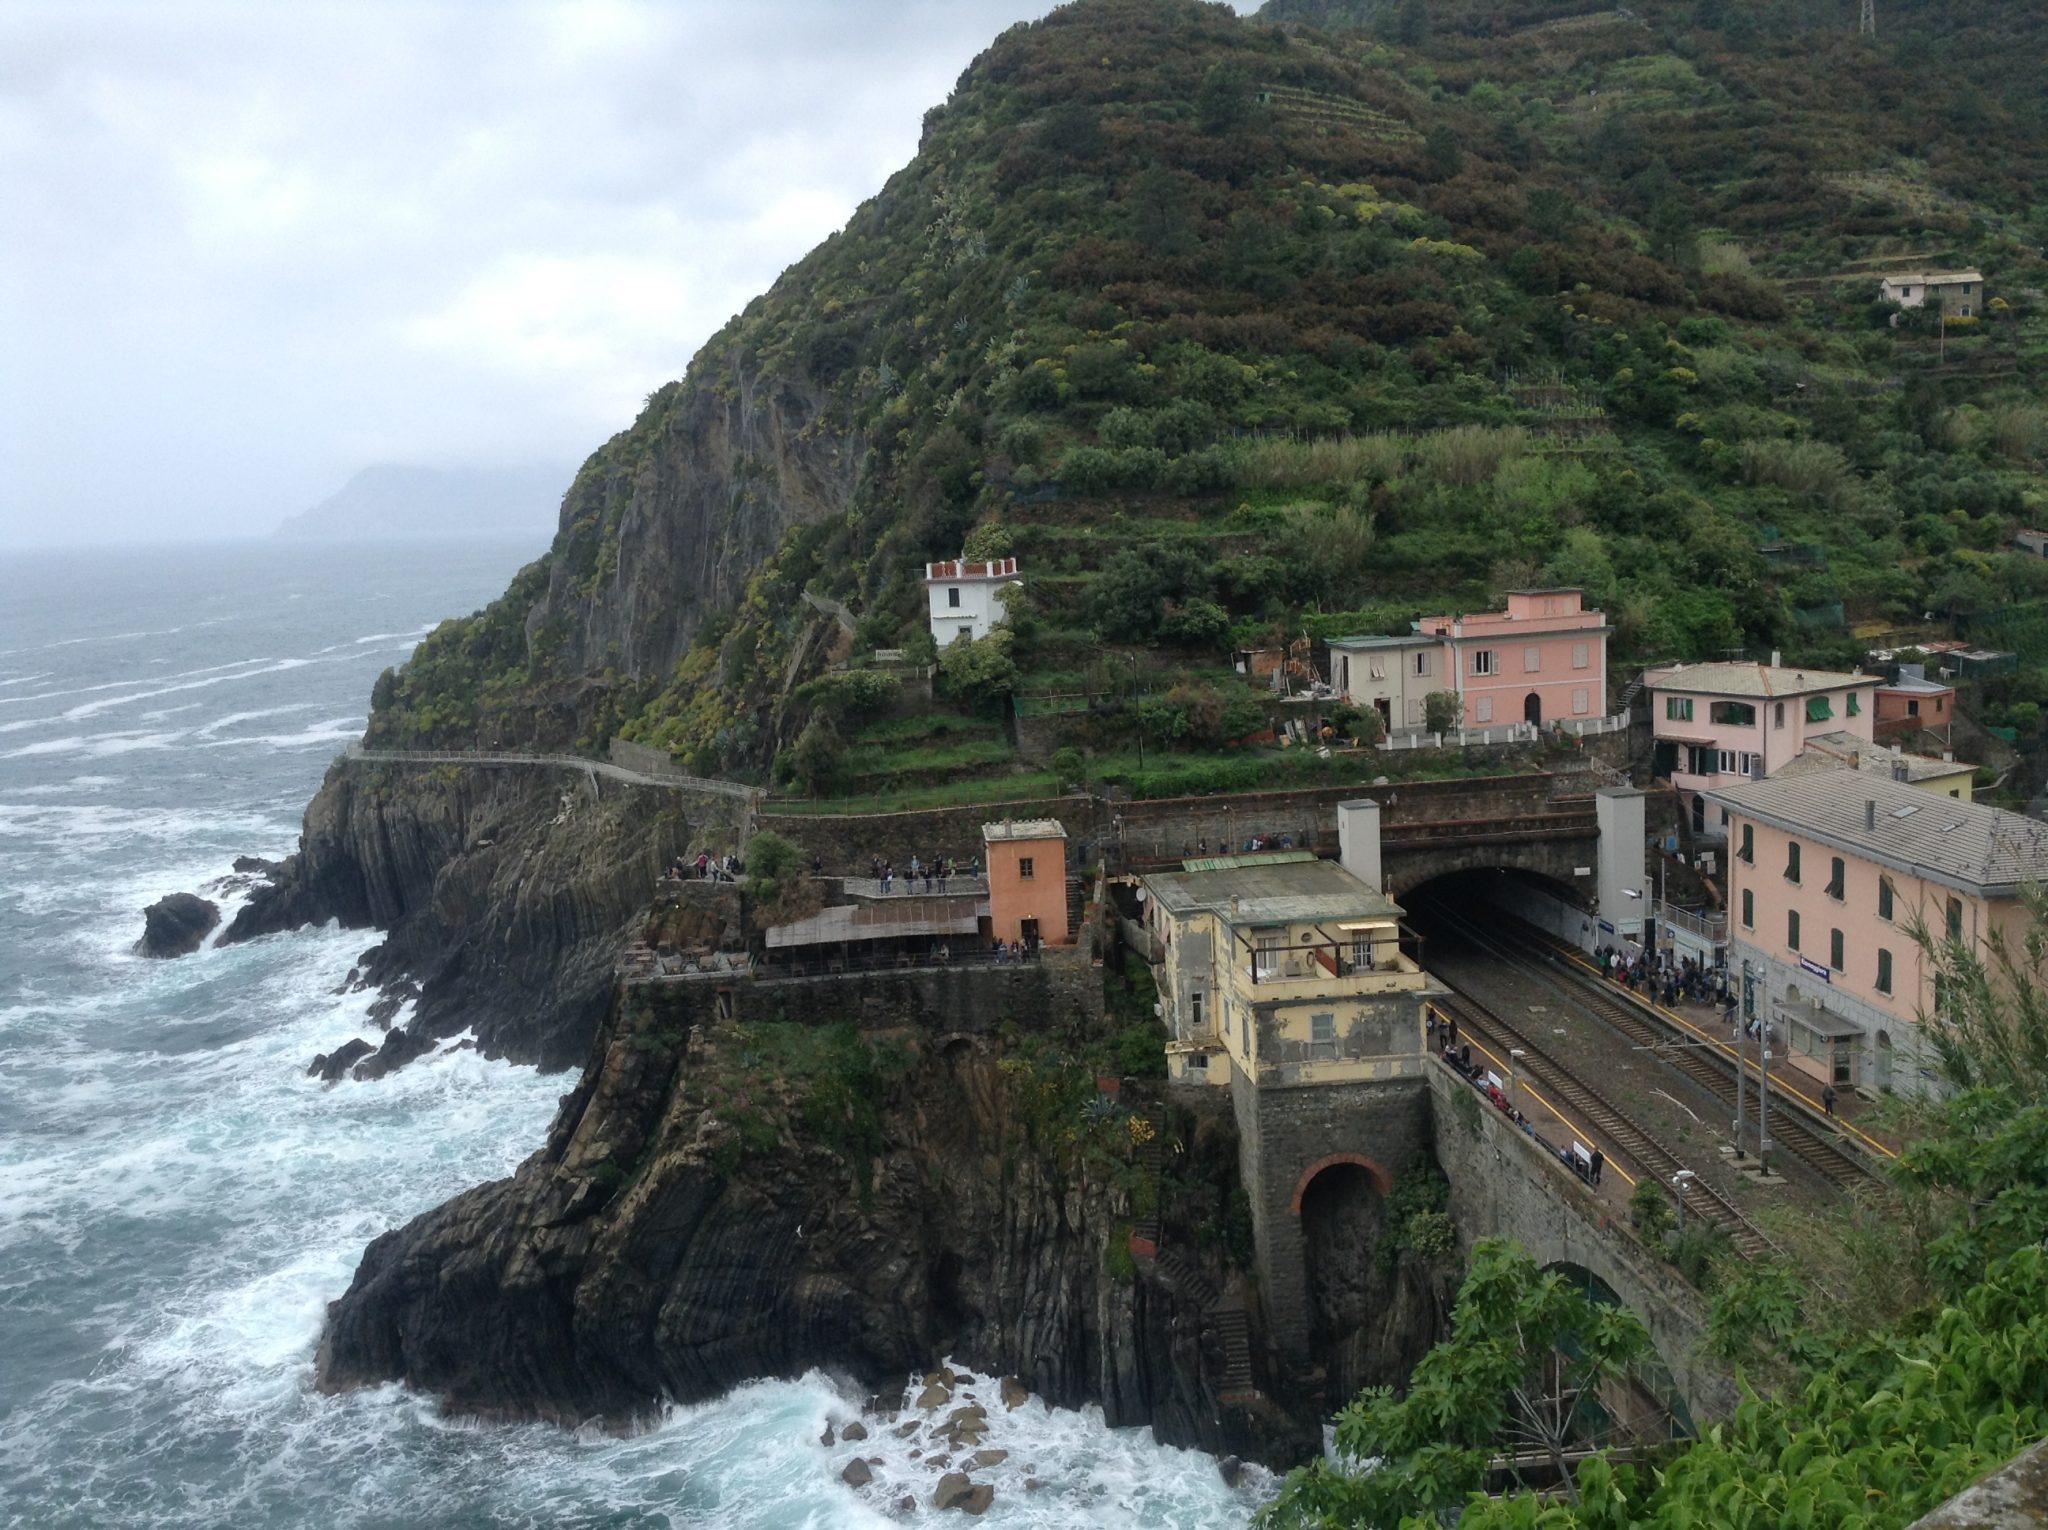 Cinque Terre: The famous five Italian villages